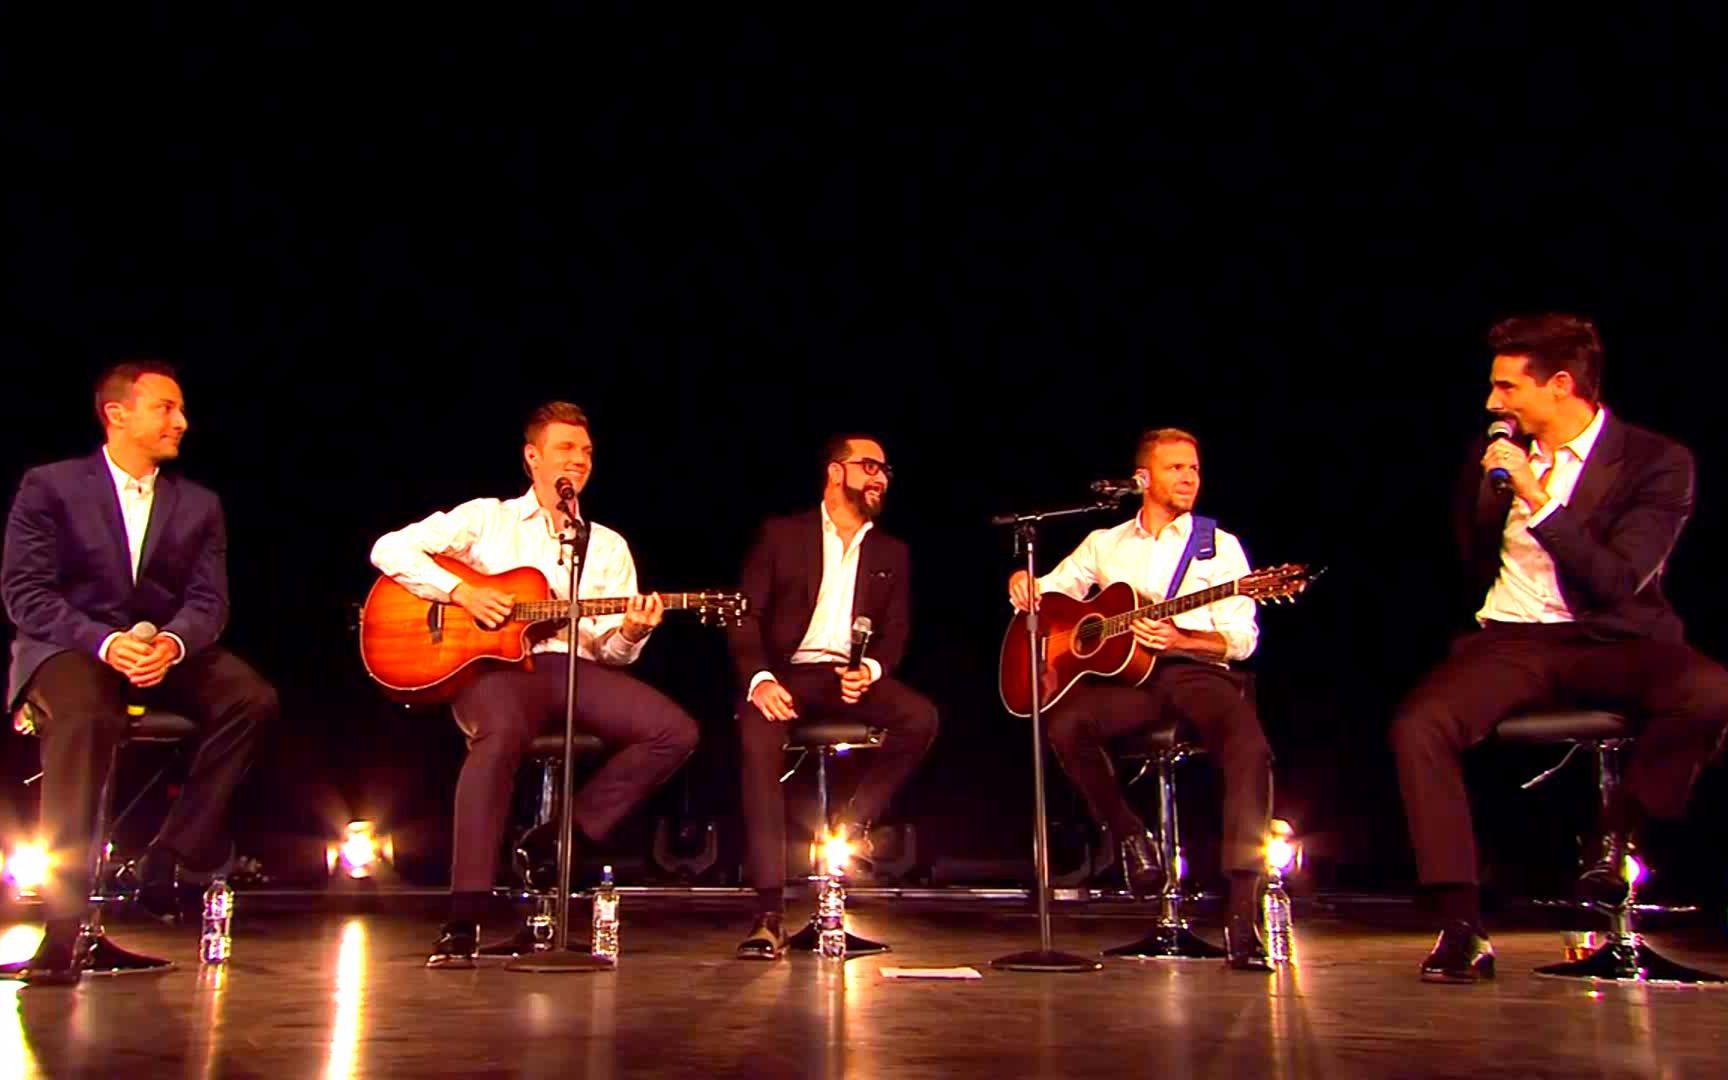 后街男孩2015年影院直播不插電演唱會 Backstreet Boys Dominion Theatre London 2015_嗶哩嗶哩 (゜-゜)つロ 干杯~-bilibili